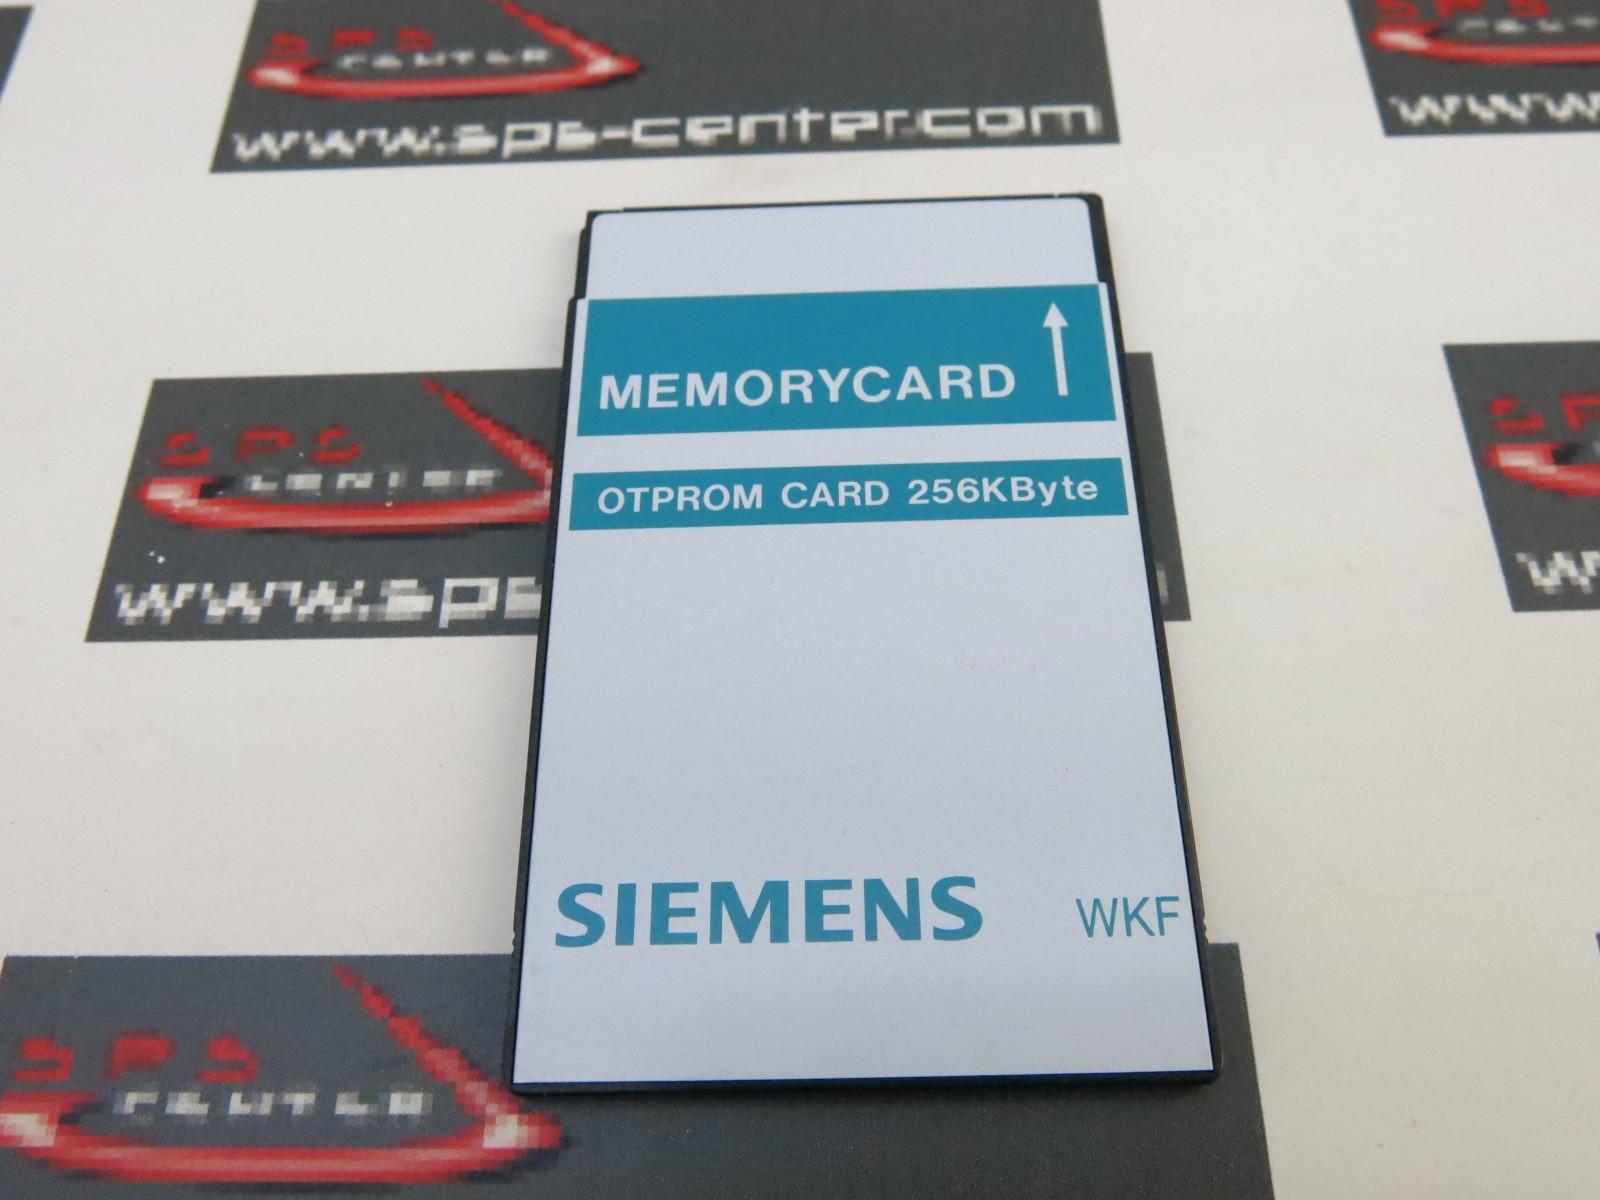 SIEMENS 6fm1470-7aa25 otprom CARD 256kbyte MEMORYCARD